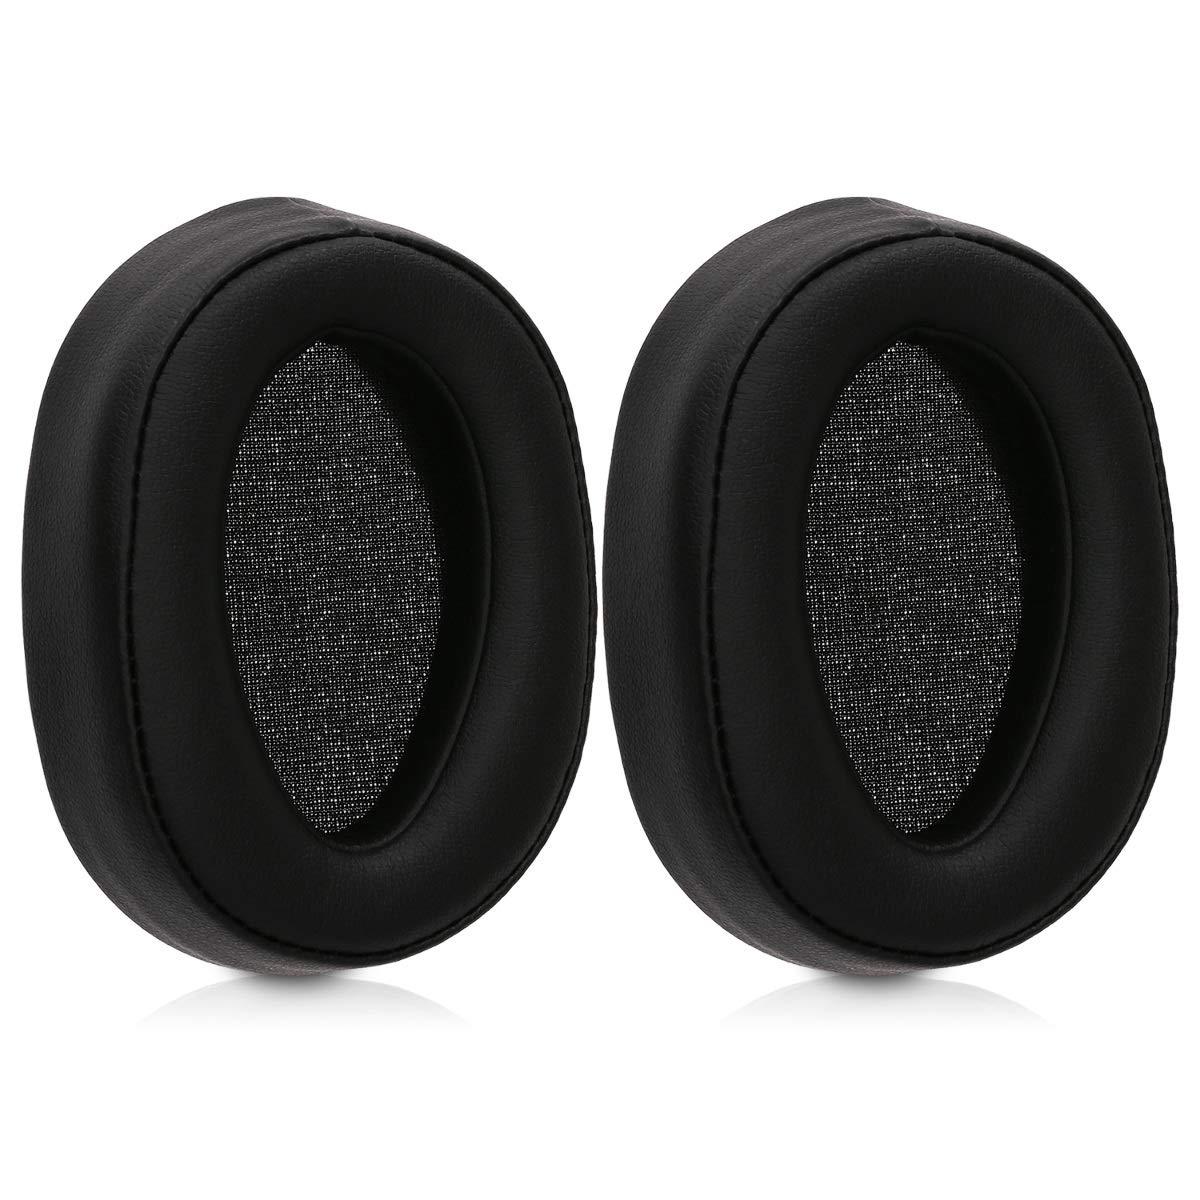 Almohadillas Auriculares Sony Mdr-100abn Negras (xsr)